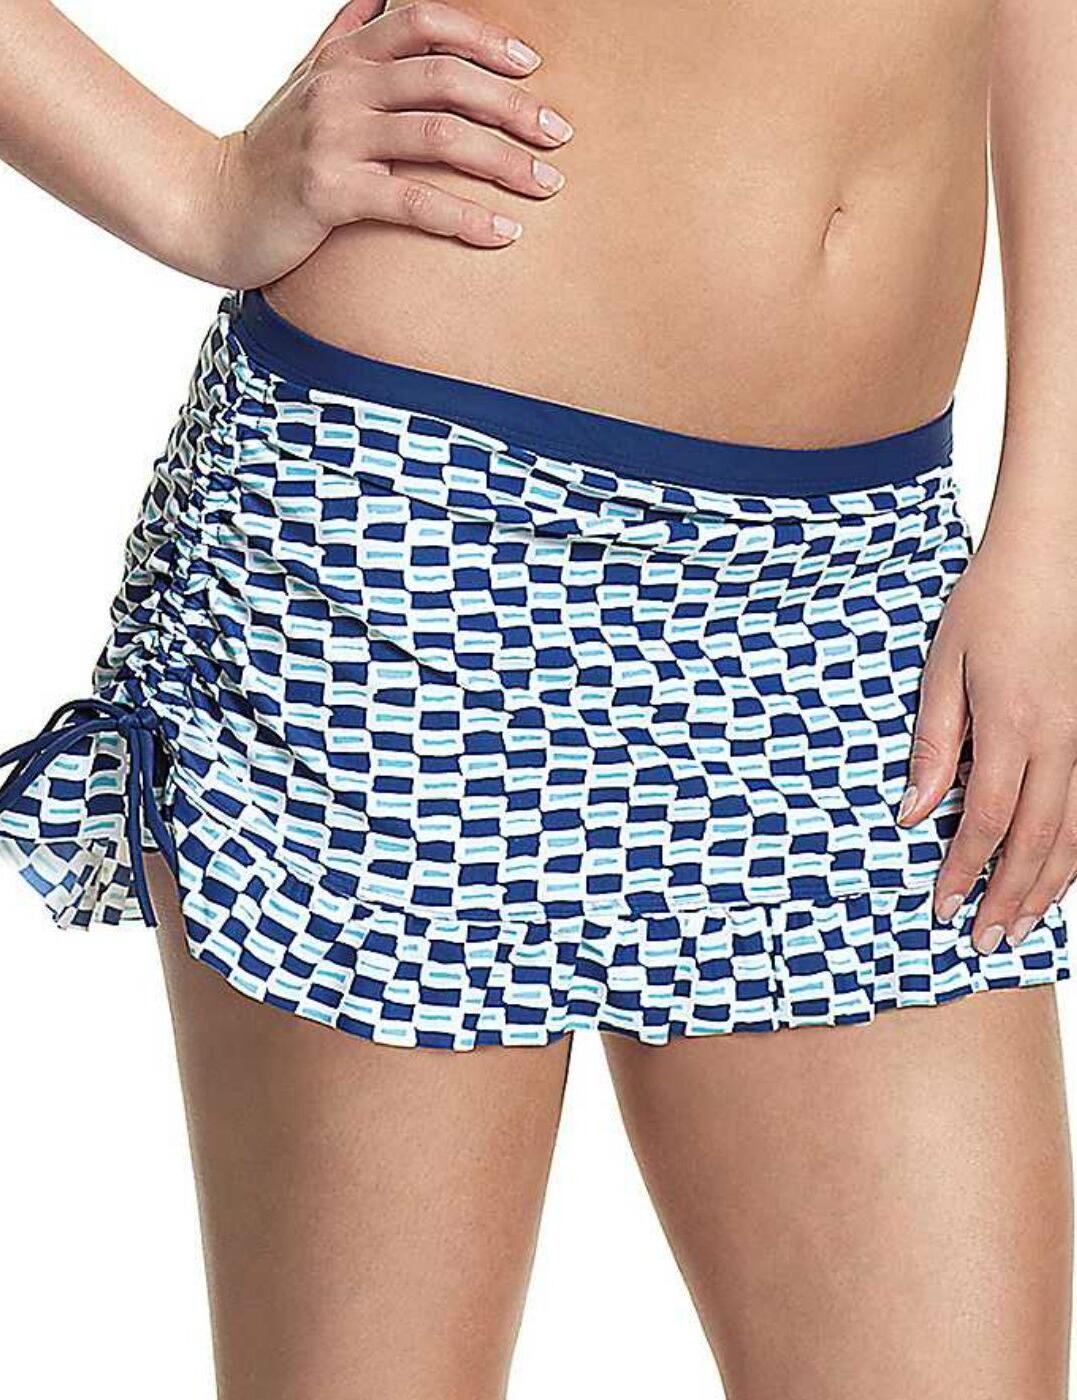 CW0066 Cleo Lucille Bikini Skirt - CW0066 Nautical Print